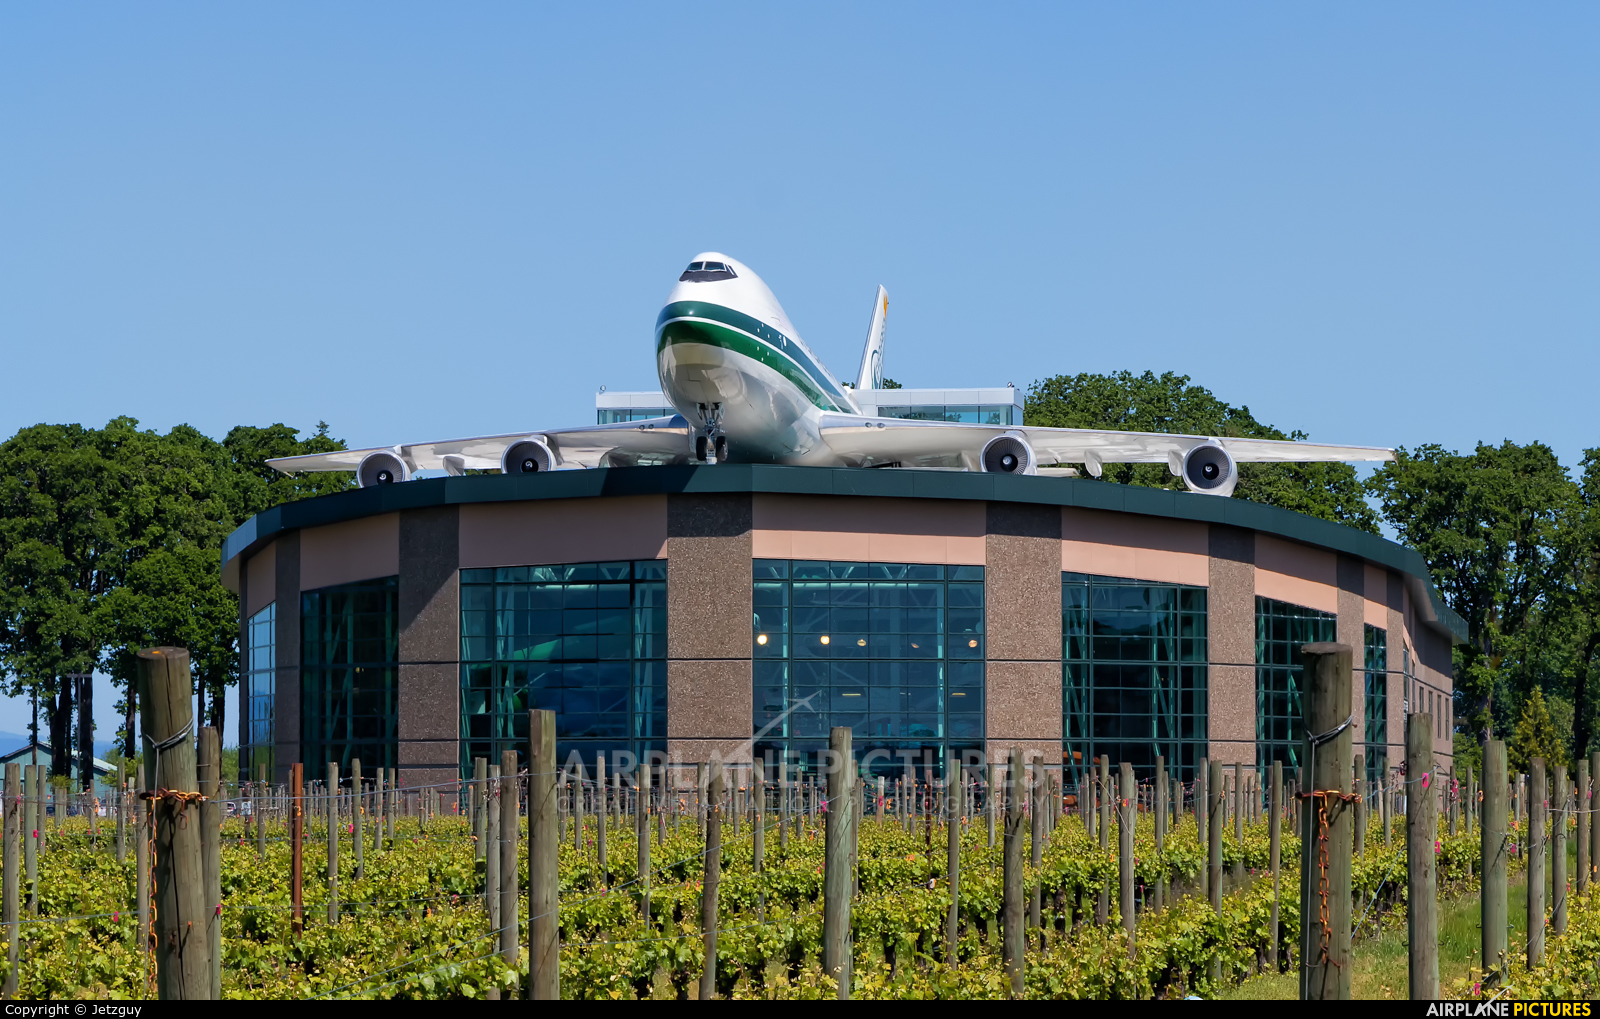 Evergreen International N481EV aircraft at McMinnville - Evergreen Aviation & Space Museum